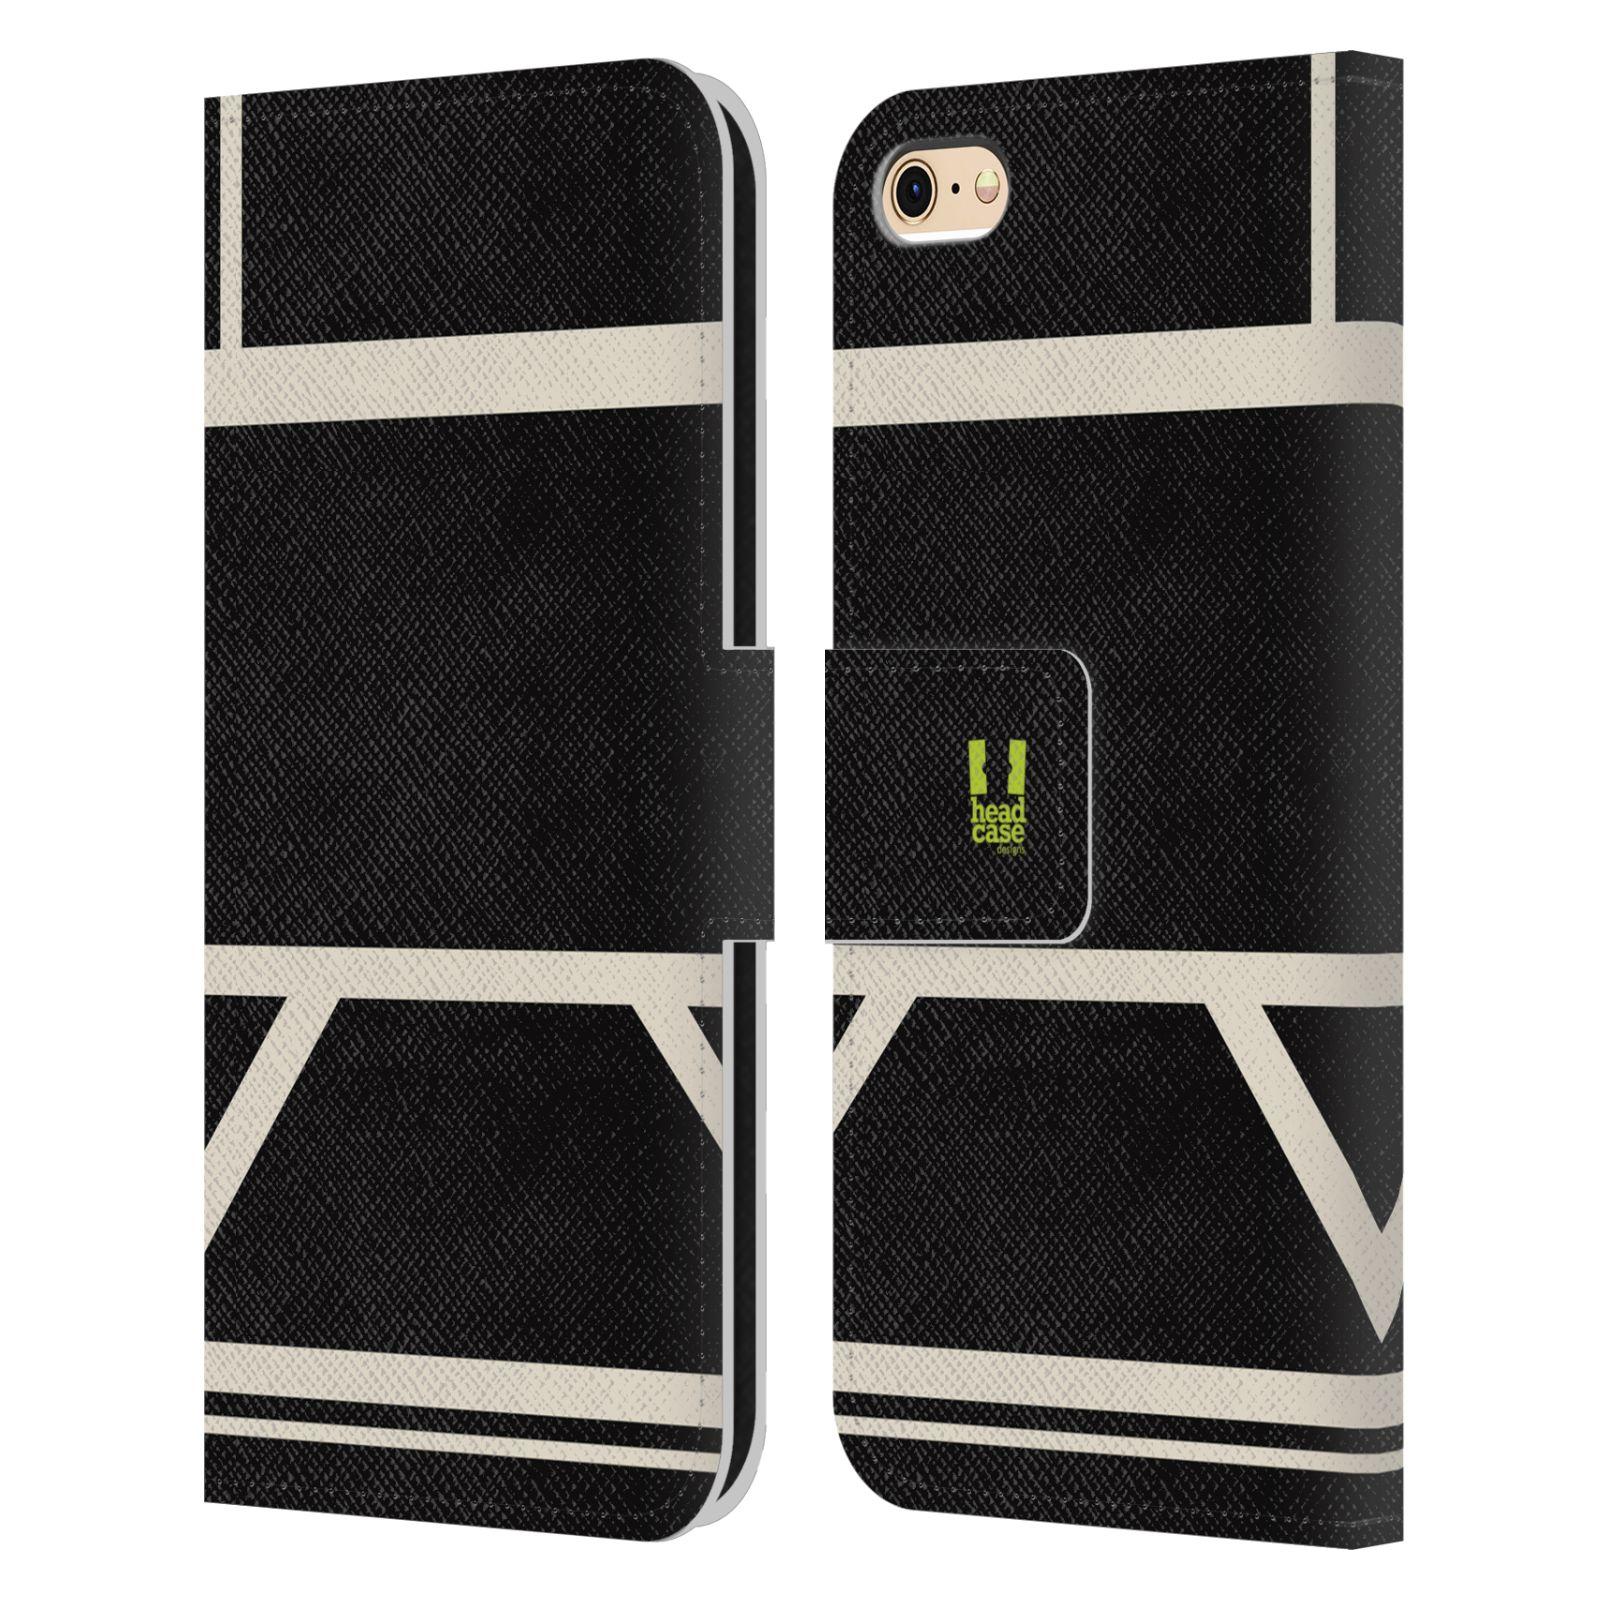 HEAD CASE Flipové pouzdro pro mobil Apple Iphone 6/6s barevné tvary černá a bílá proužek